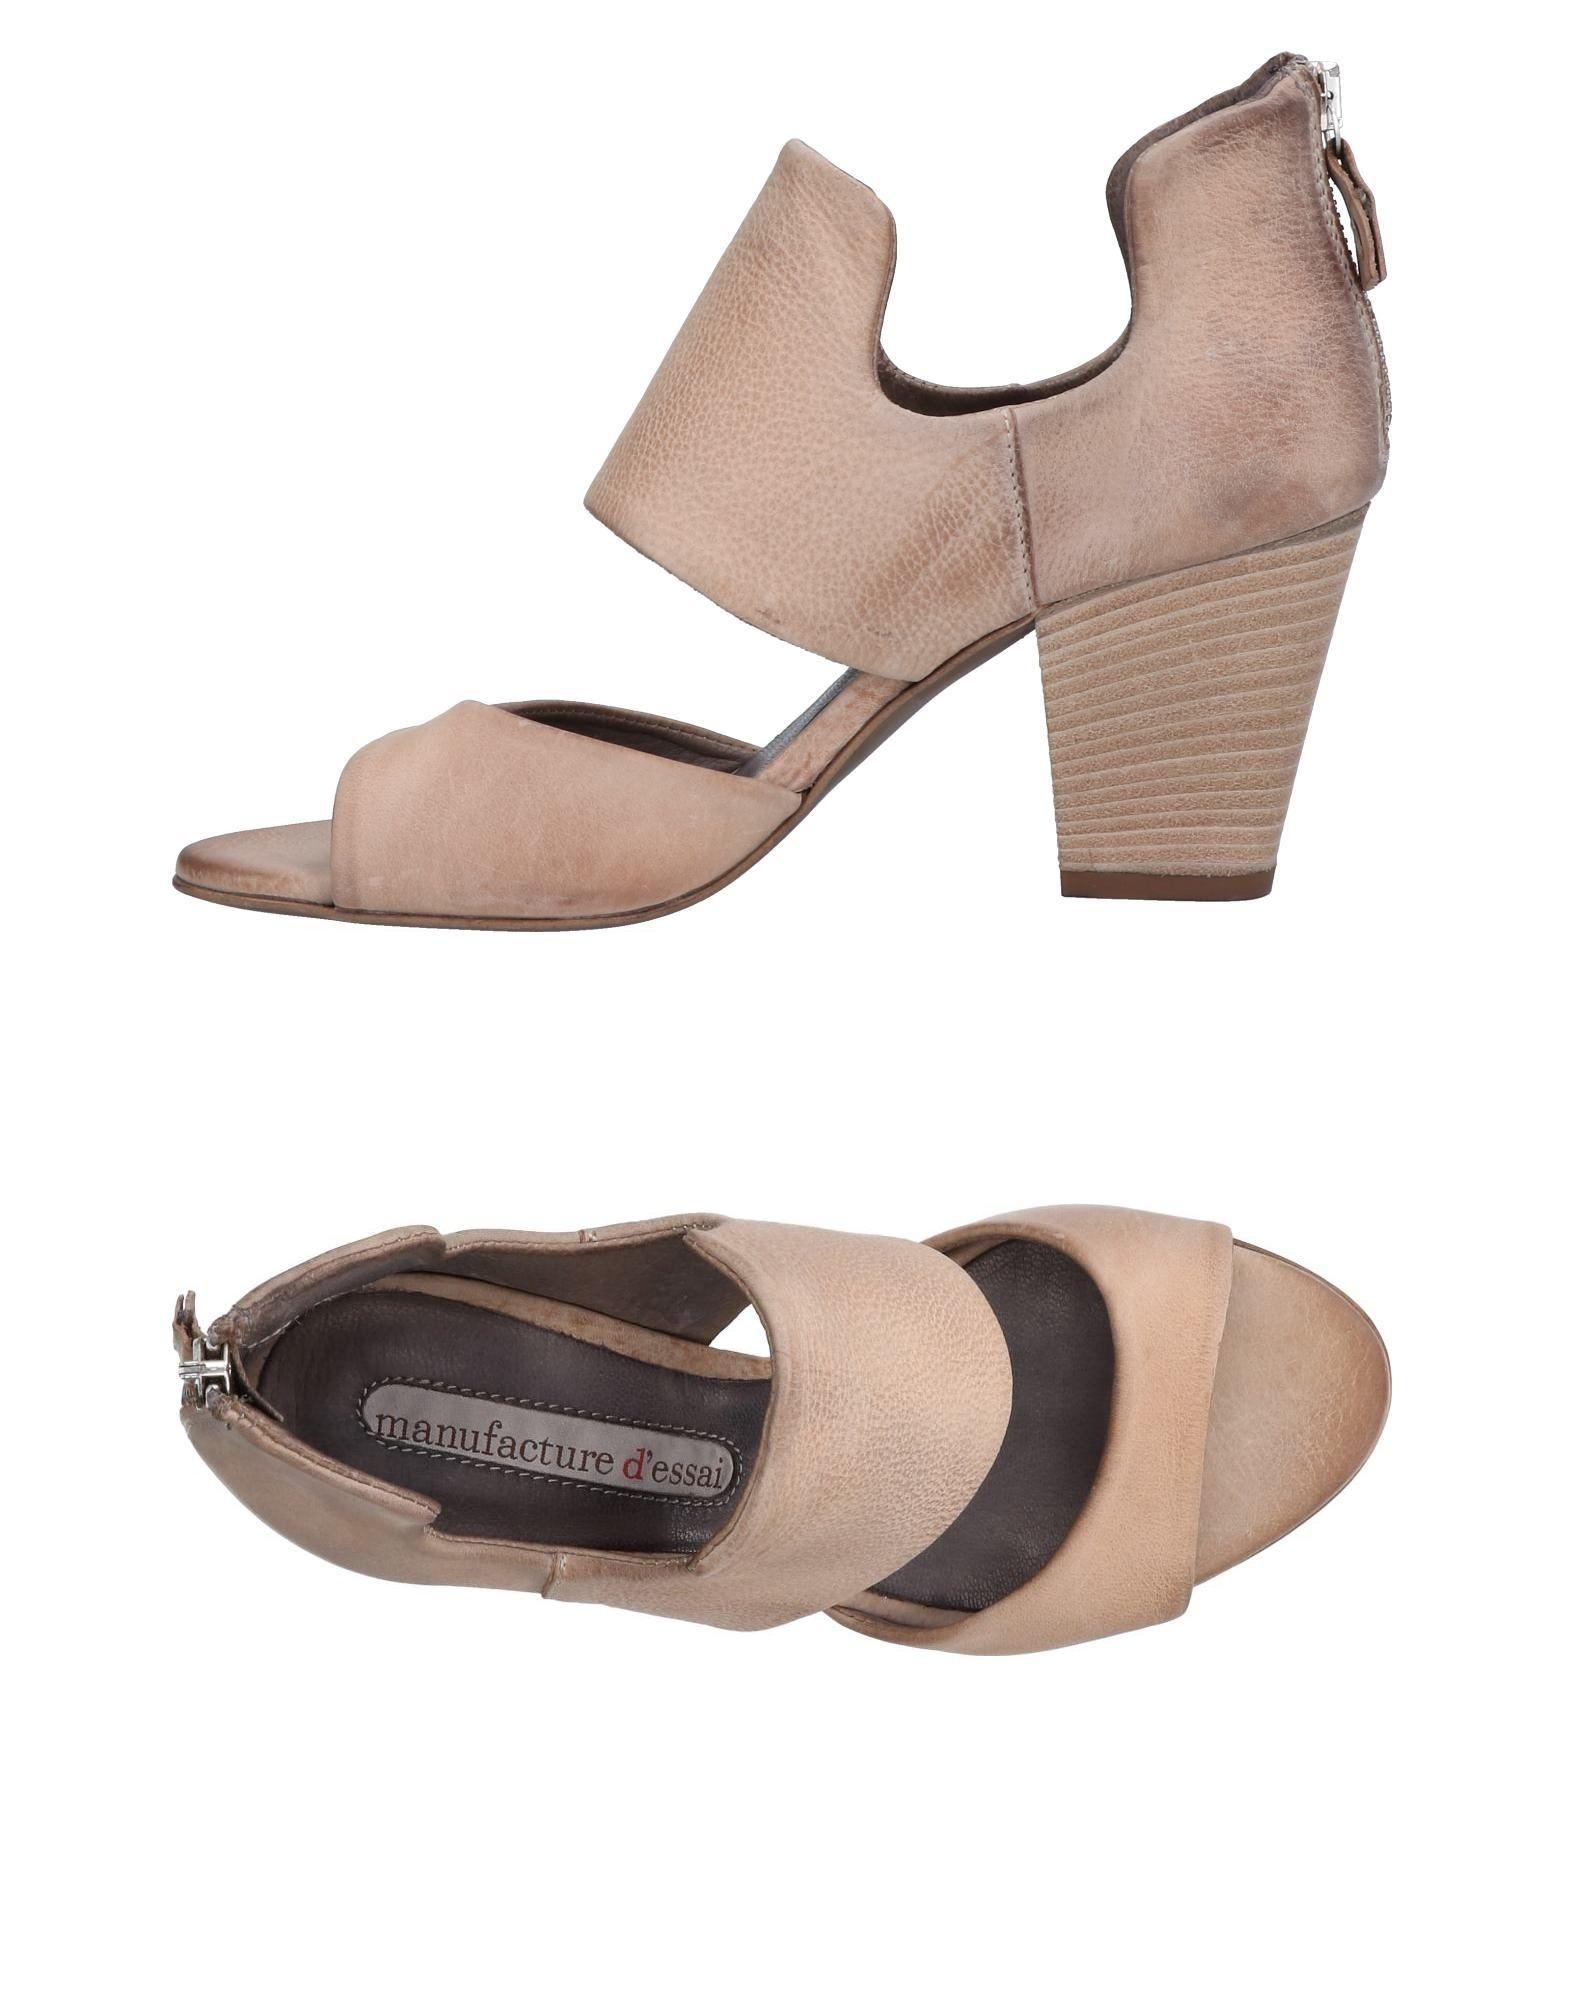 Manufacture D'essai Sandals - Women on Manufacture D'essai Sandals online on Women  Canada - 11495542IM b08963